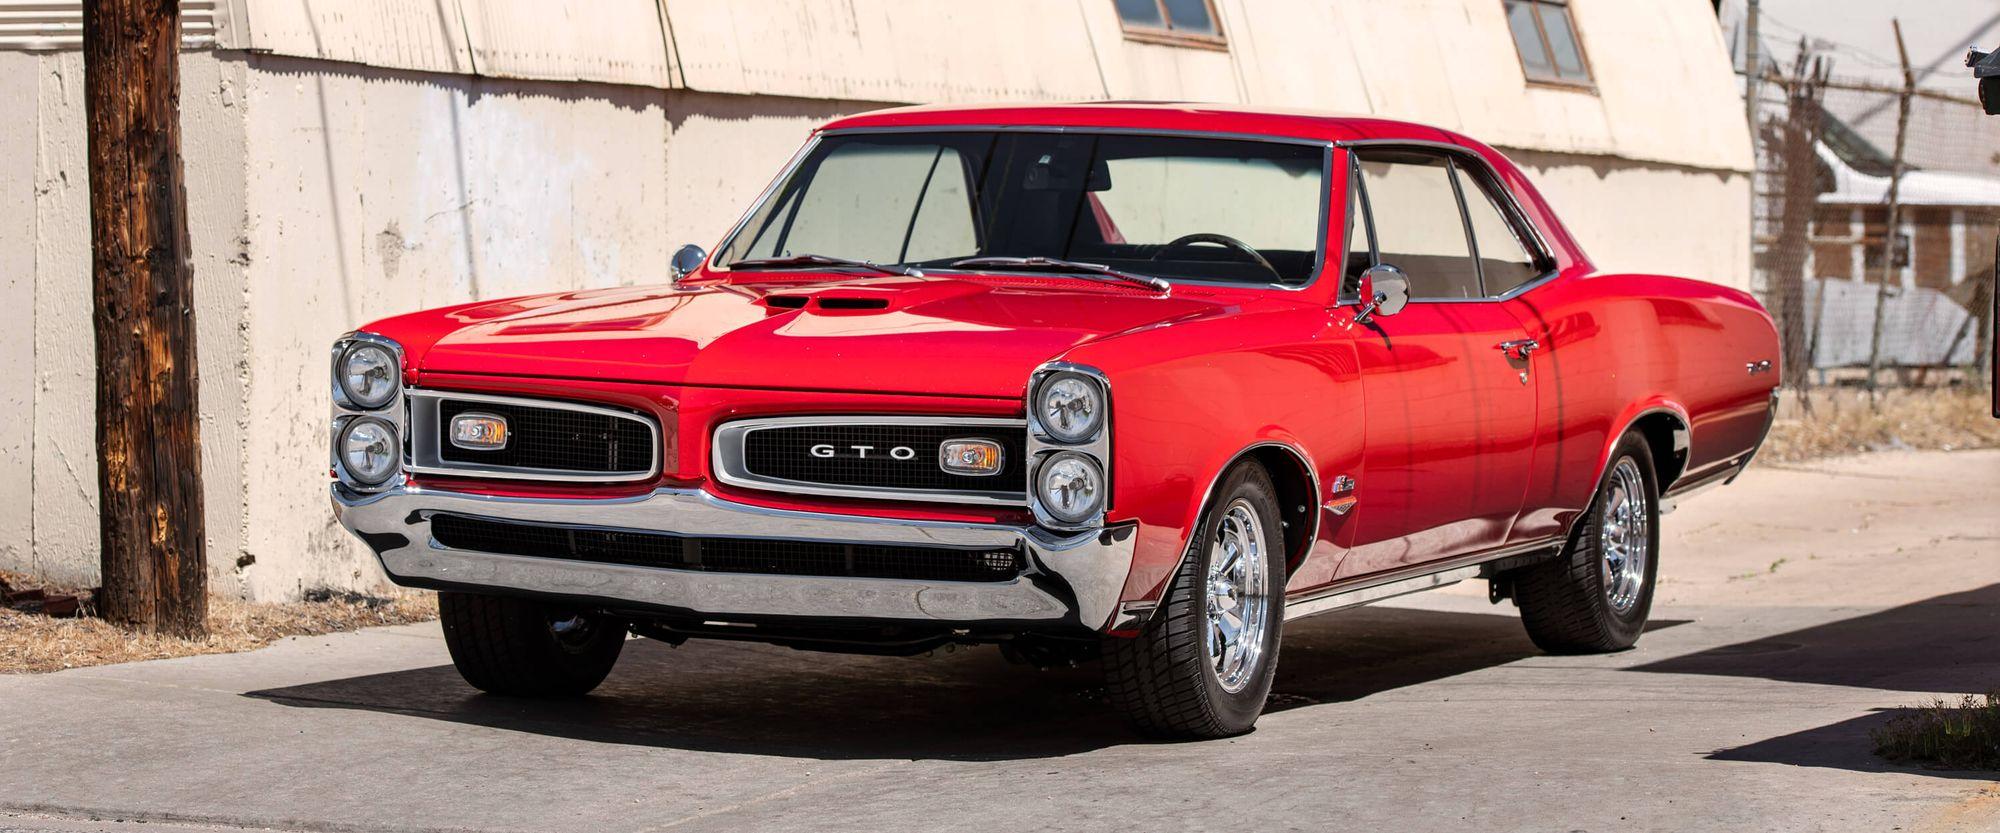 "<img src=""1966-pontiac-gto-2.jpg"" alt=""A meticulously restored 1966 Pontiac GTO"">"